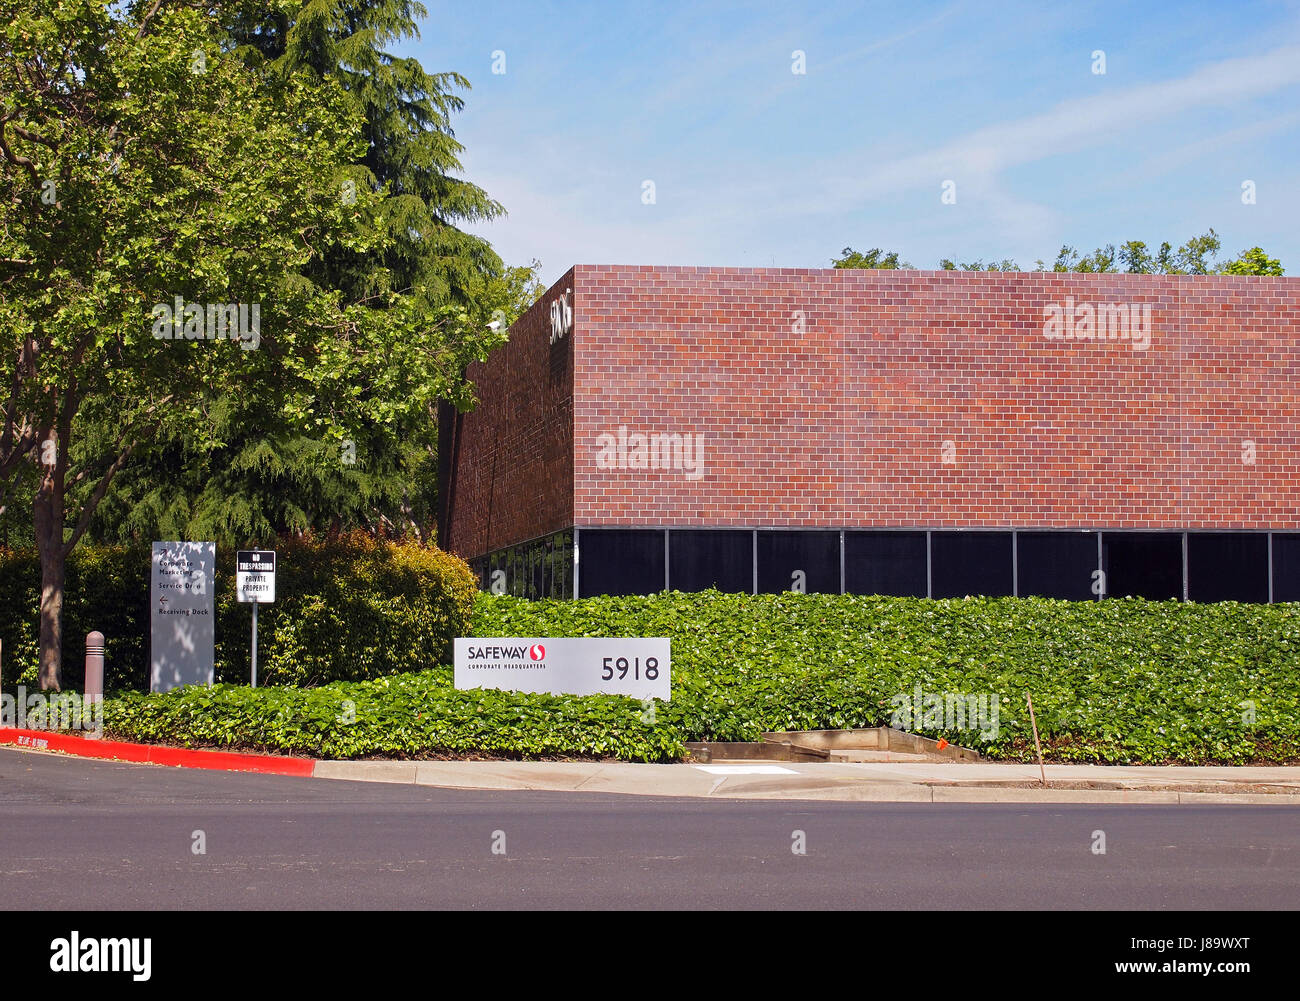 Safeway Corporate Headquarters, Pleasanton, California - Stock Image